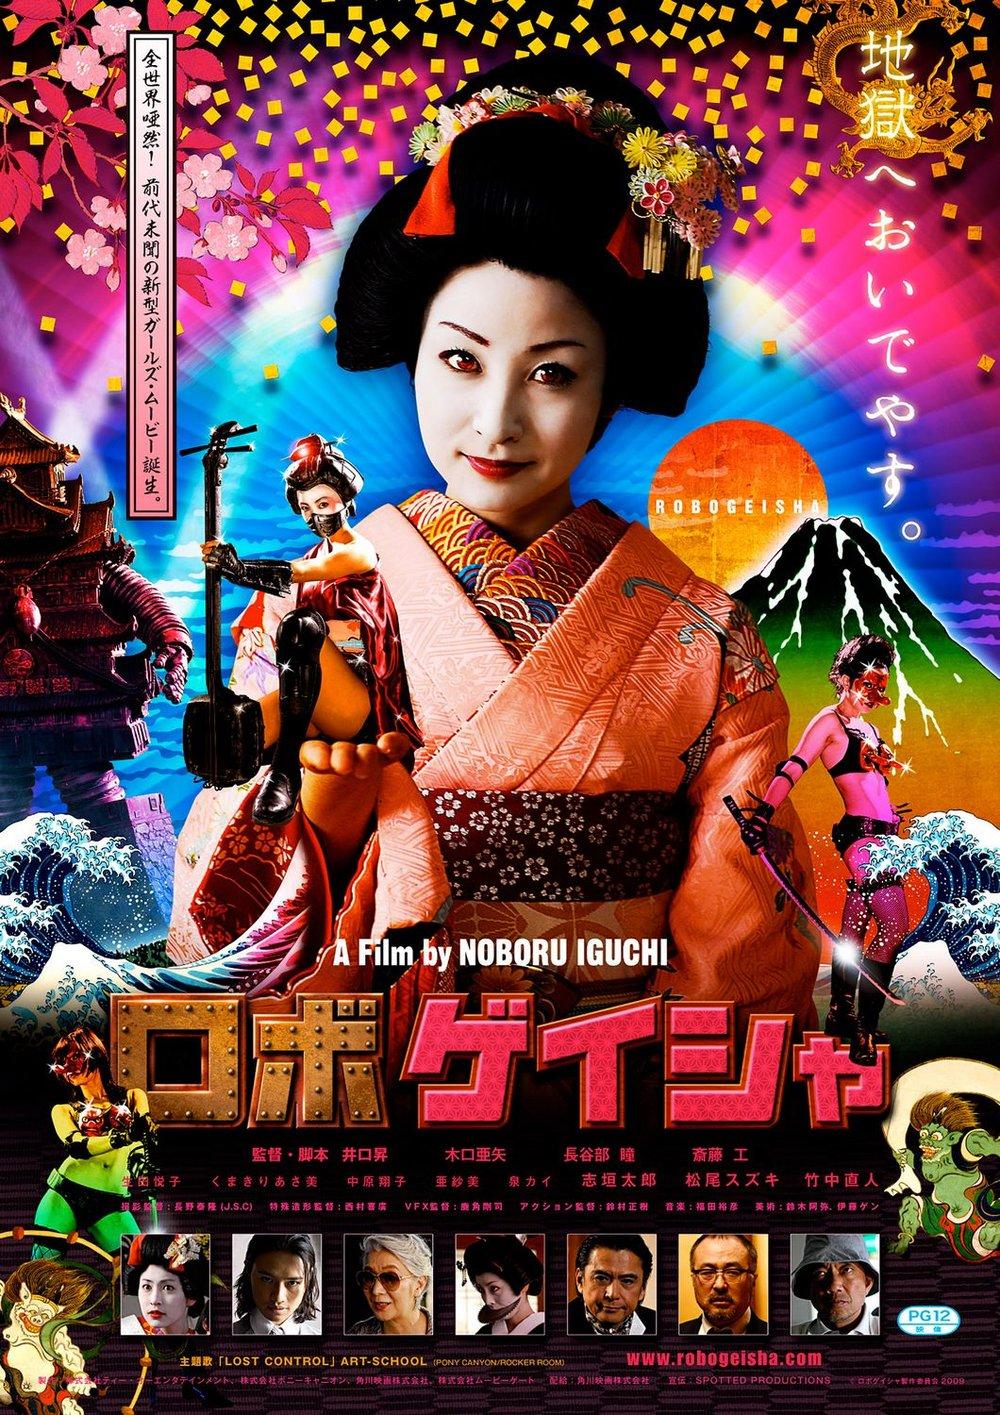 robo_geisha_ver2_xlg.jpg